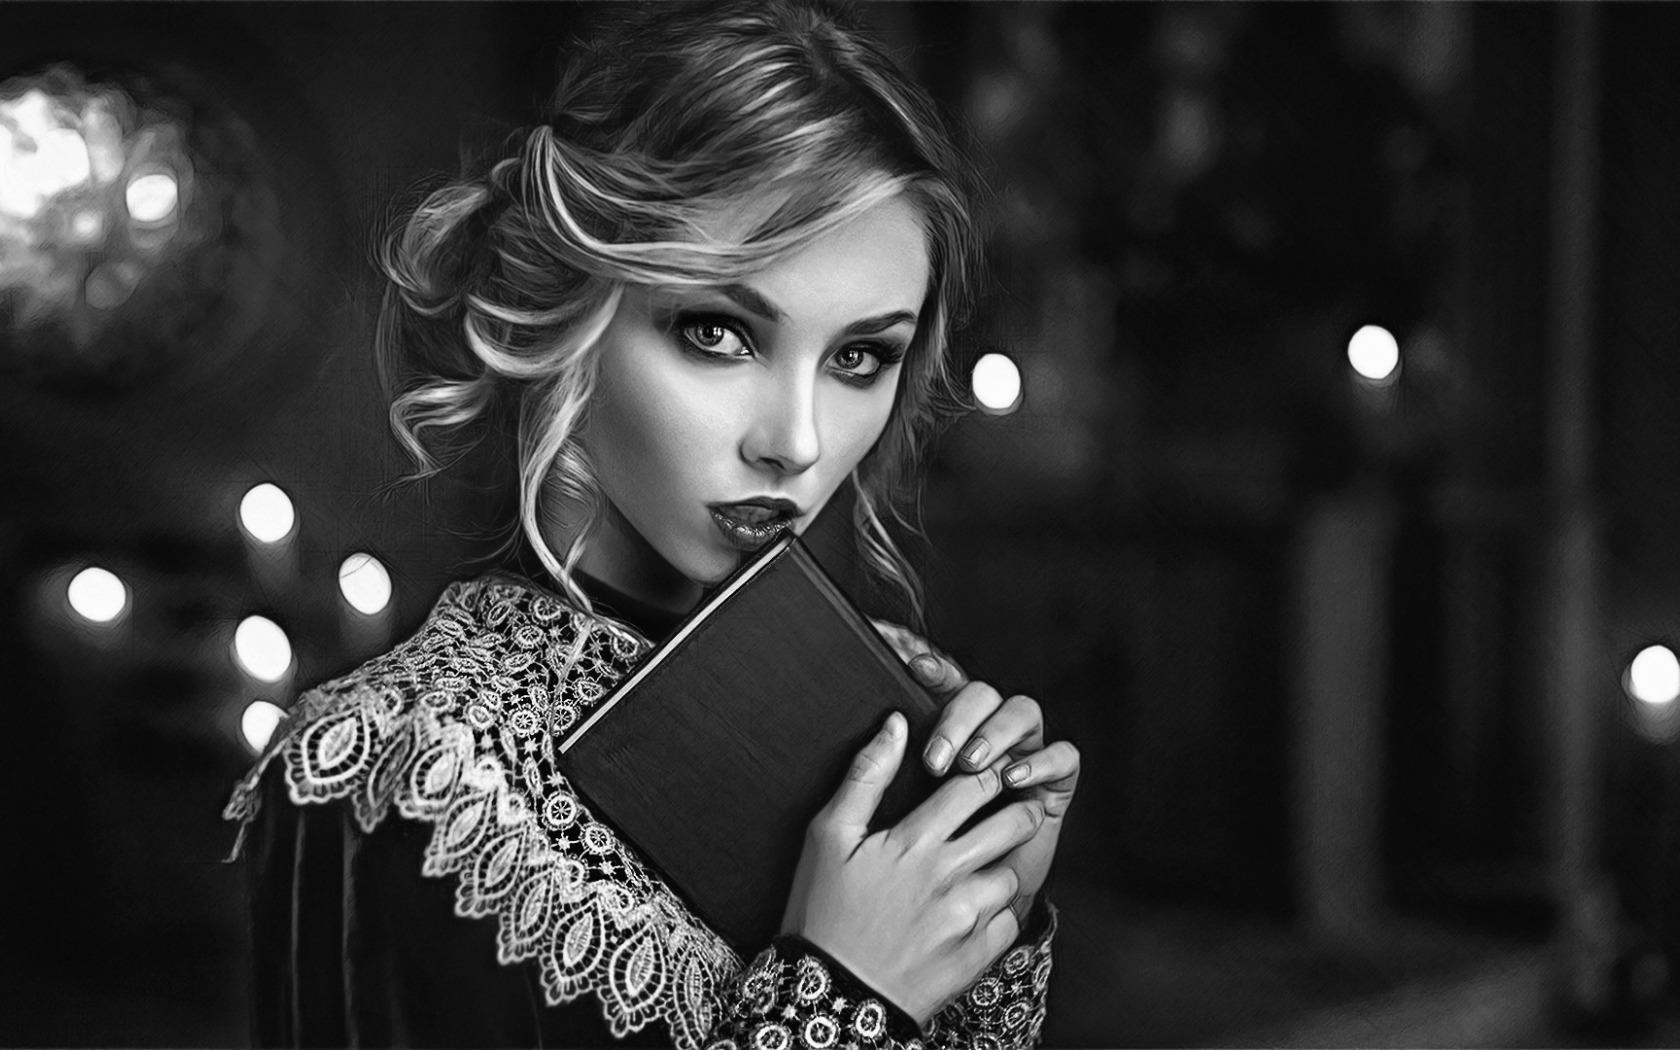 https://img4.goodfon.ru/original/1680x1050/7/2d/alisa-tarasenko-devushka-foto-risunok-prostye-karandashi-chi.jpg